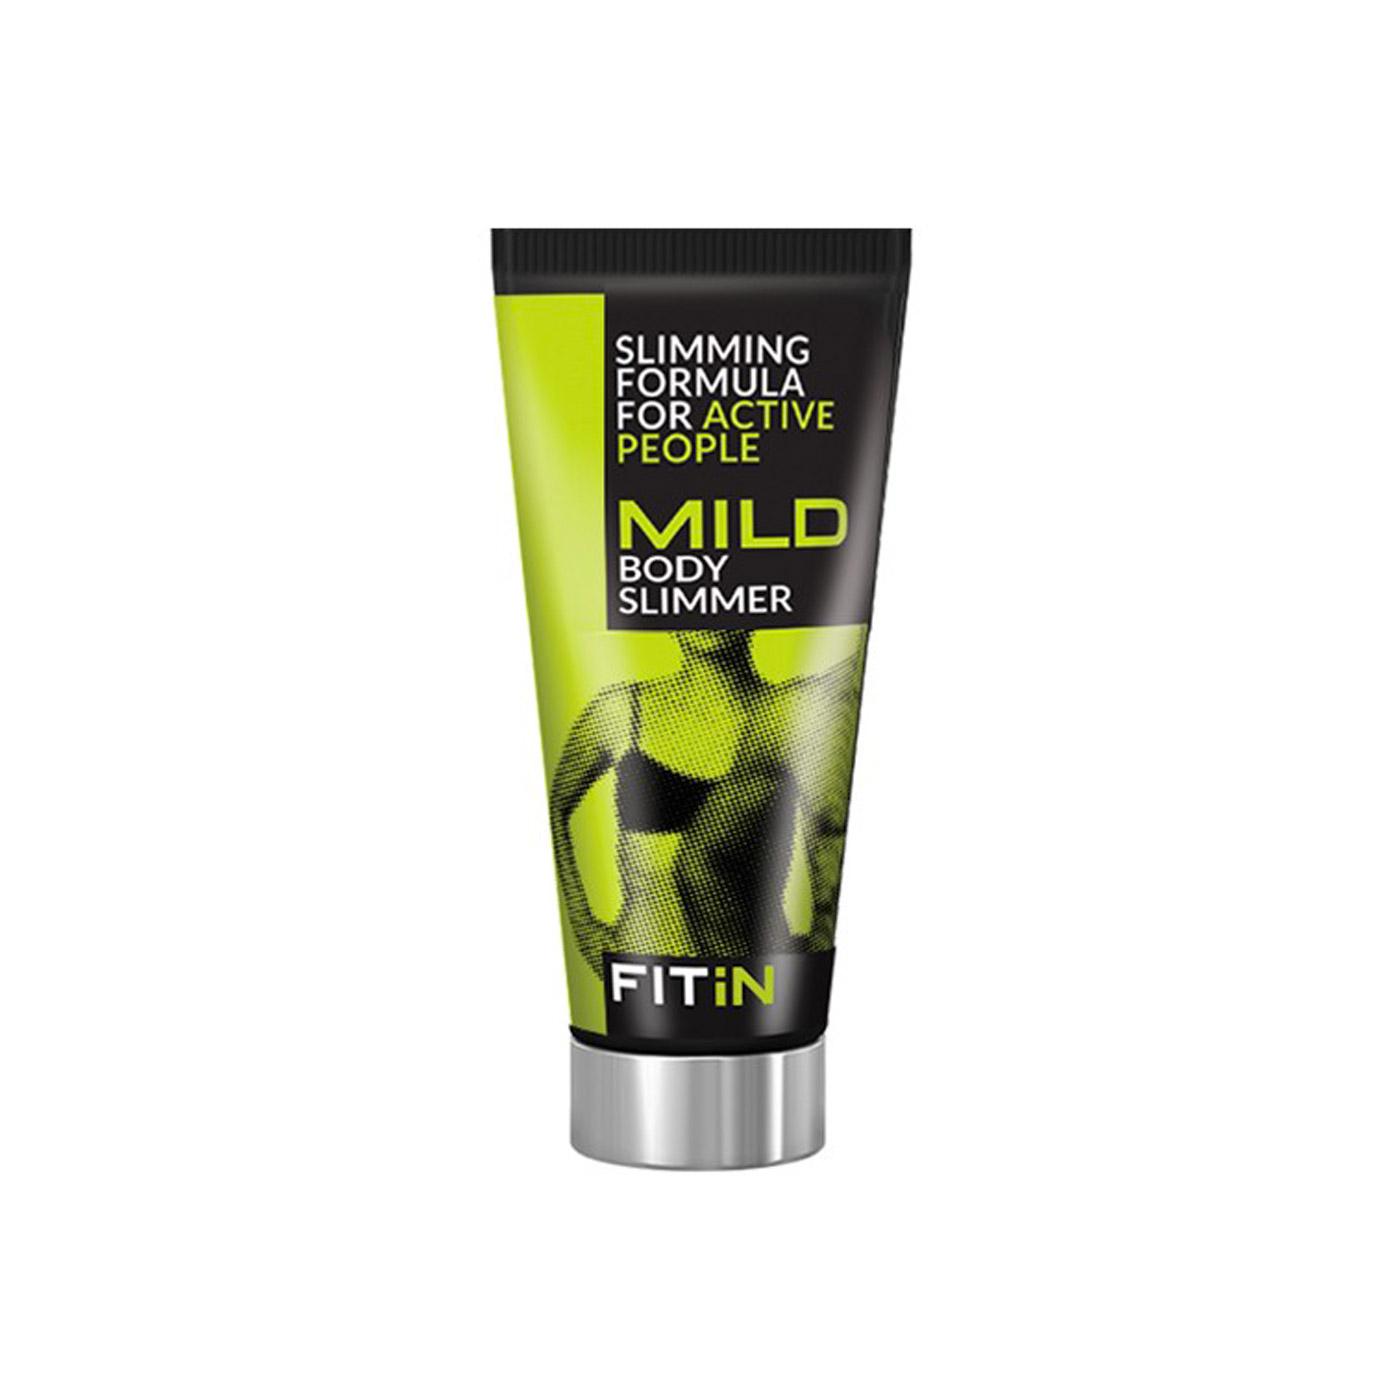 FITIiN MILD BODY SLIMMER 150 ML